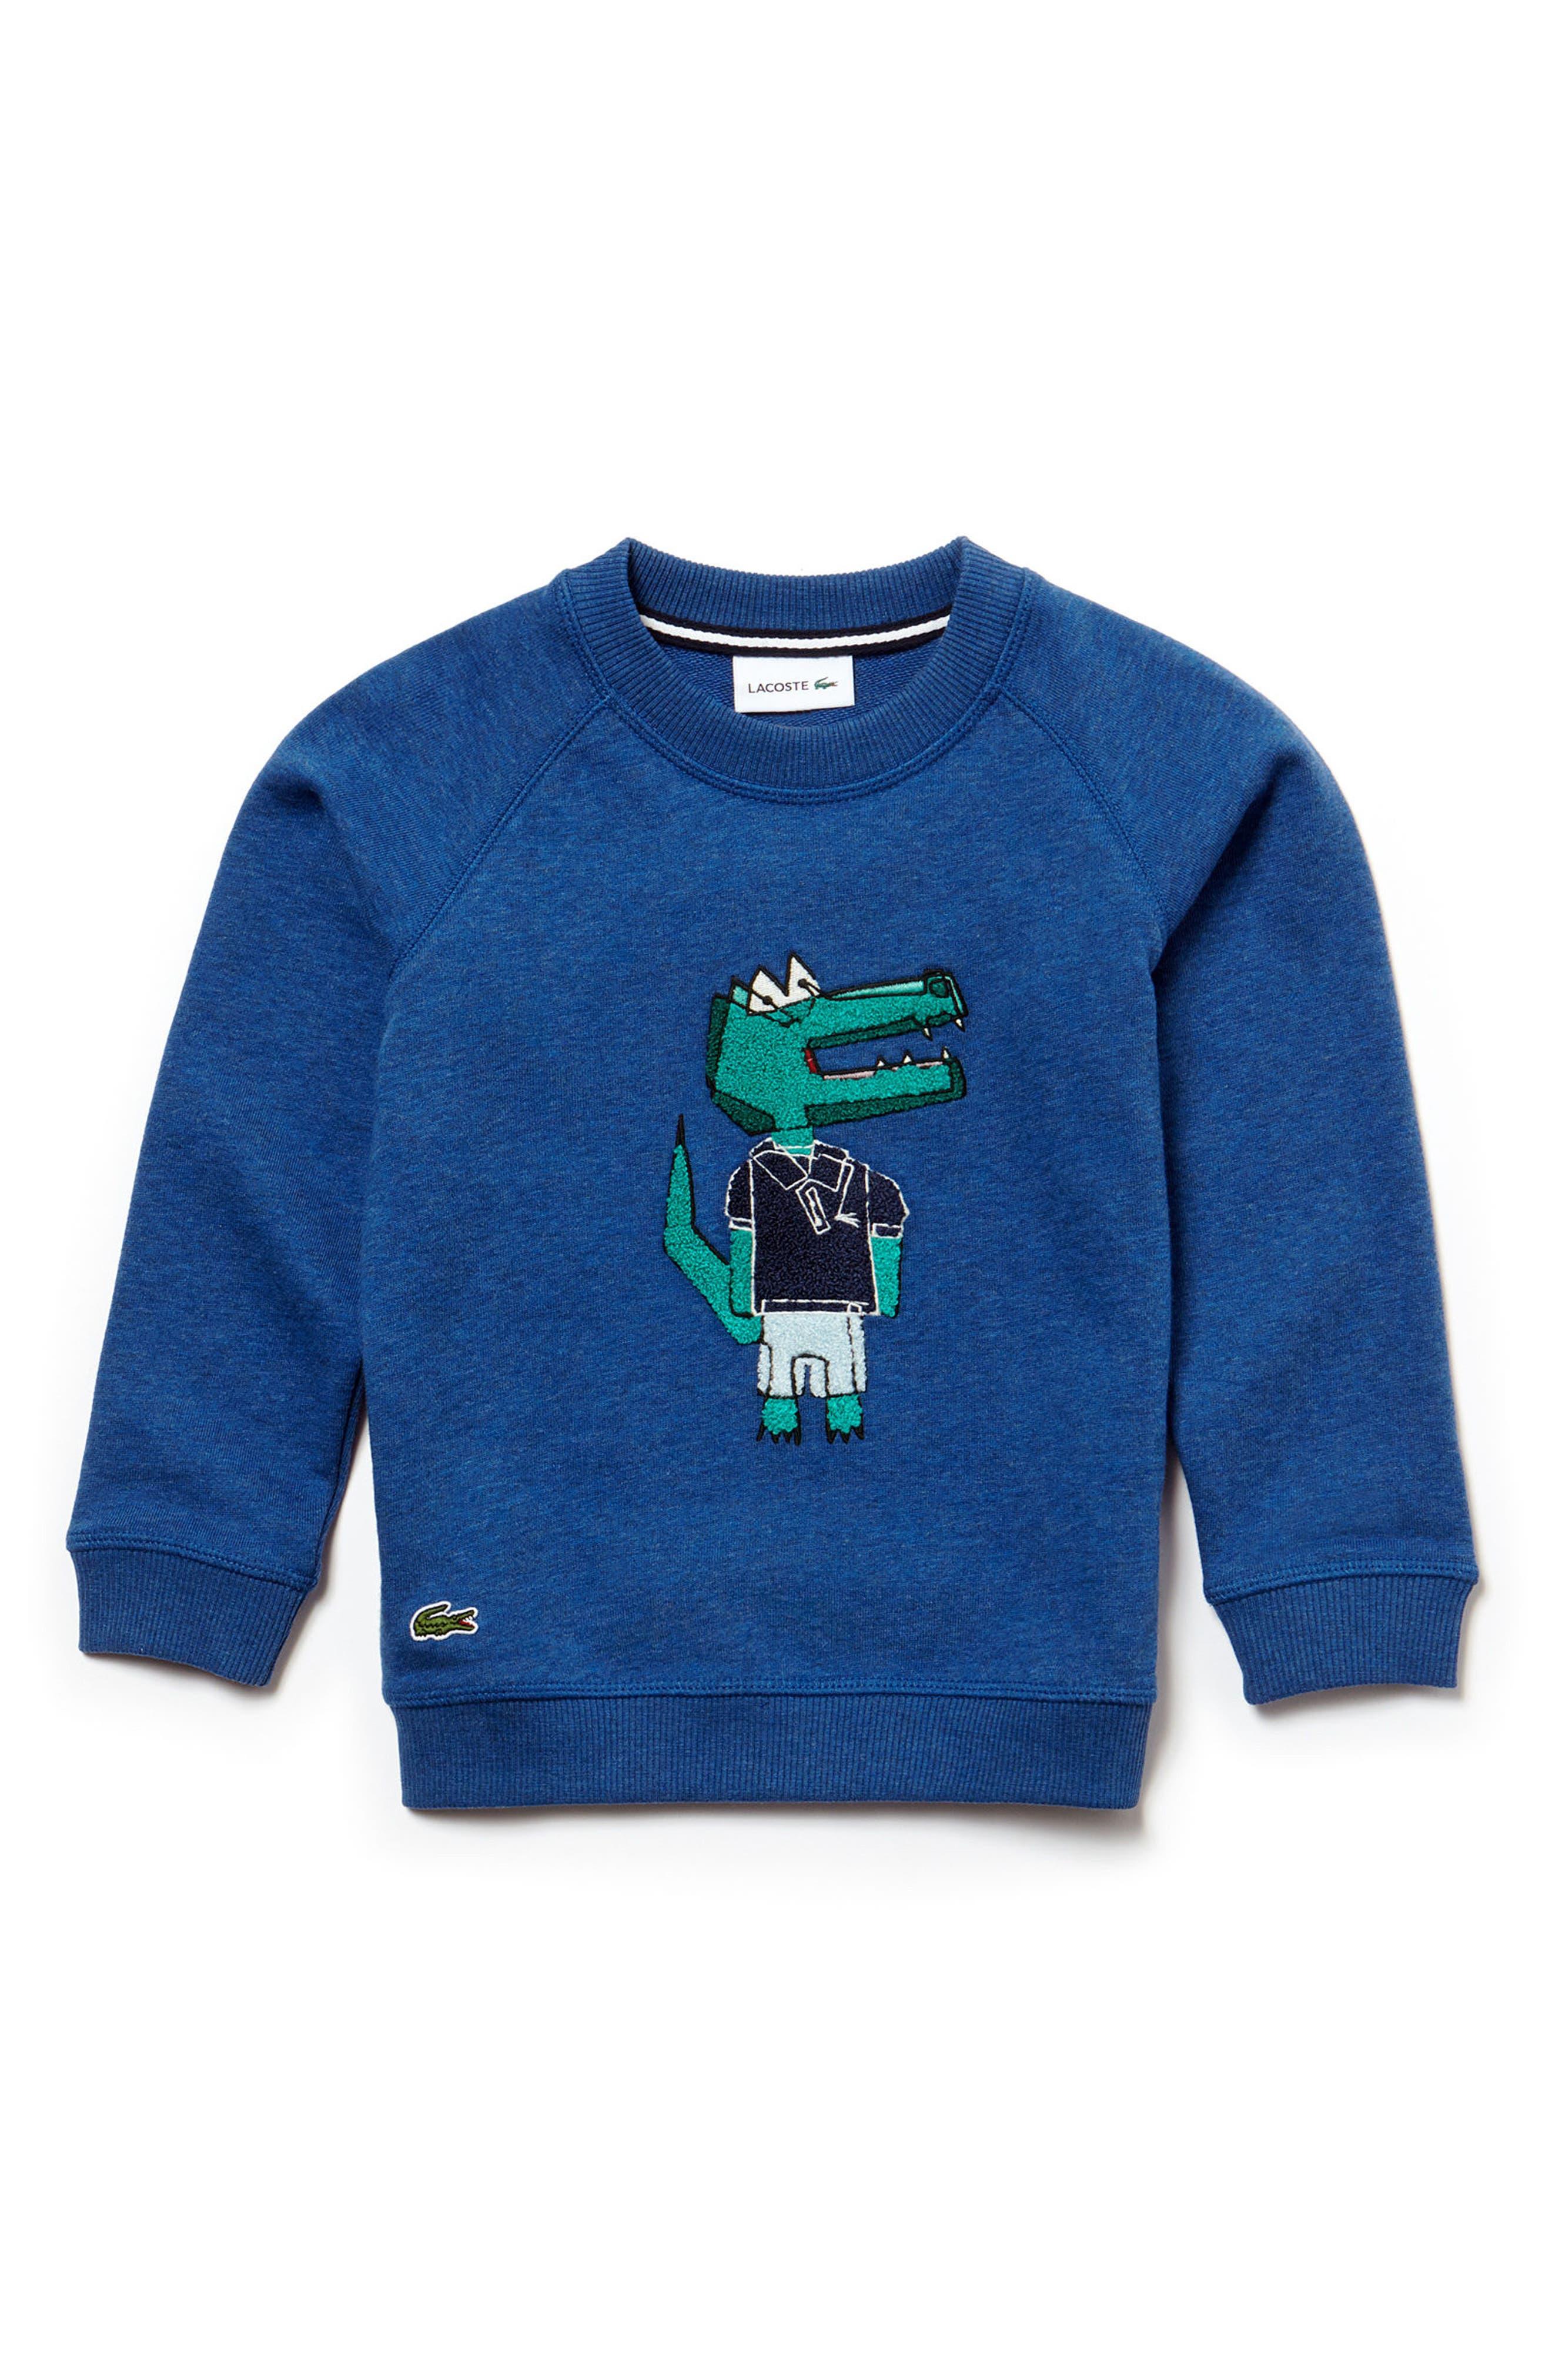 Lacoste Crocodile Sweater (Toddler Boys & Little Boys)